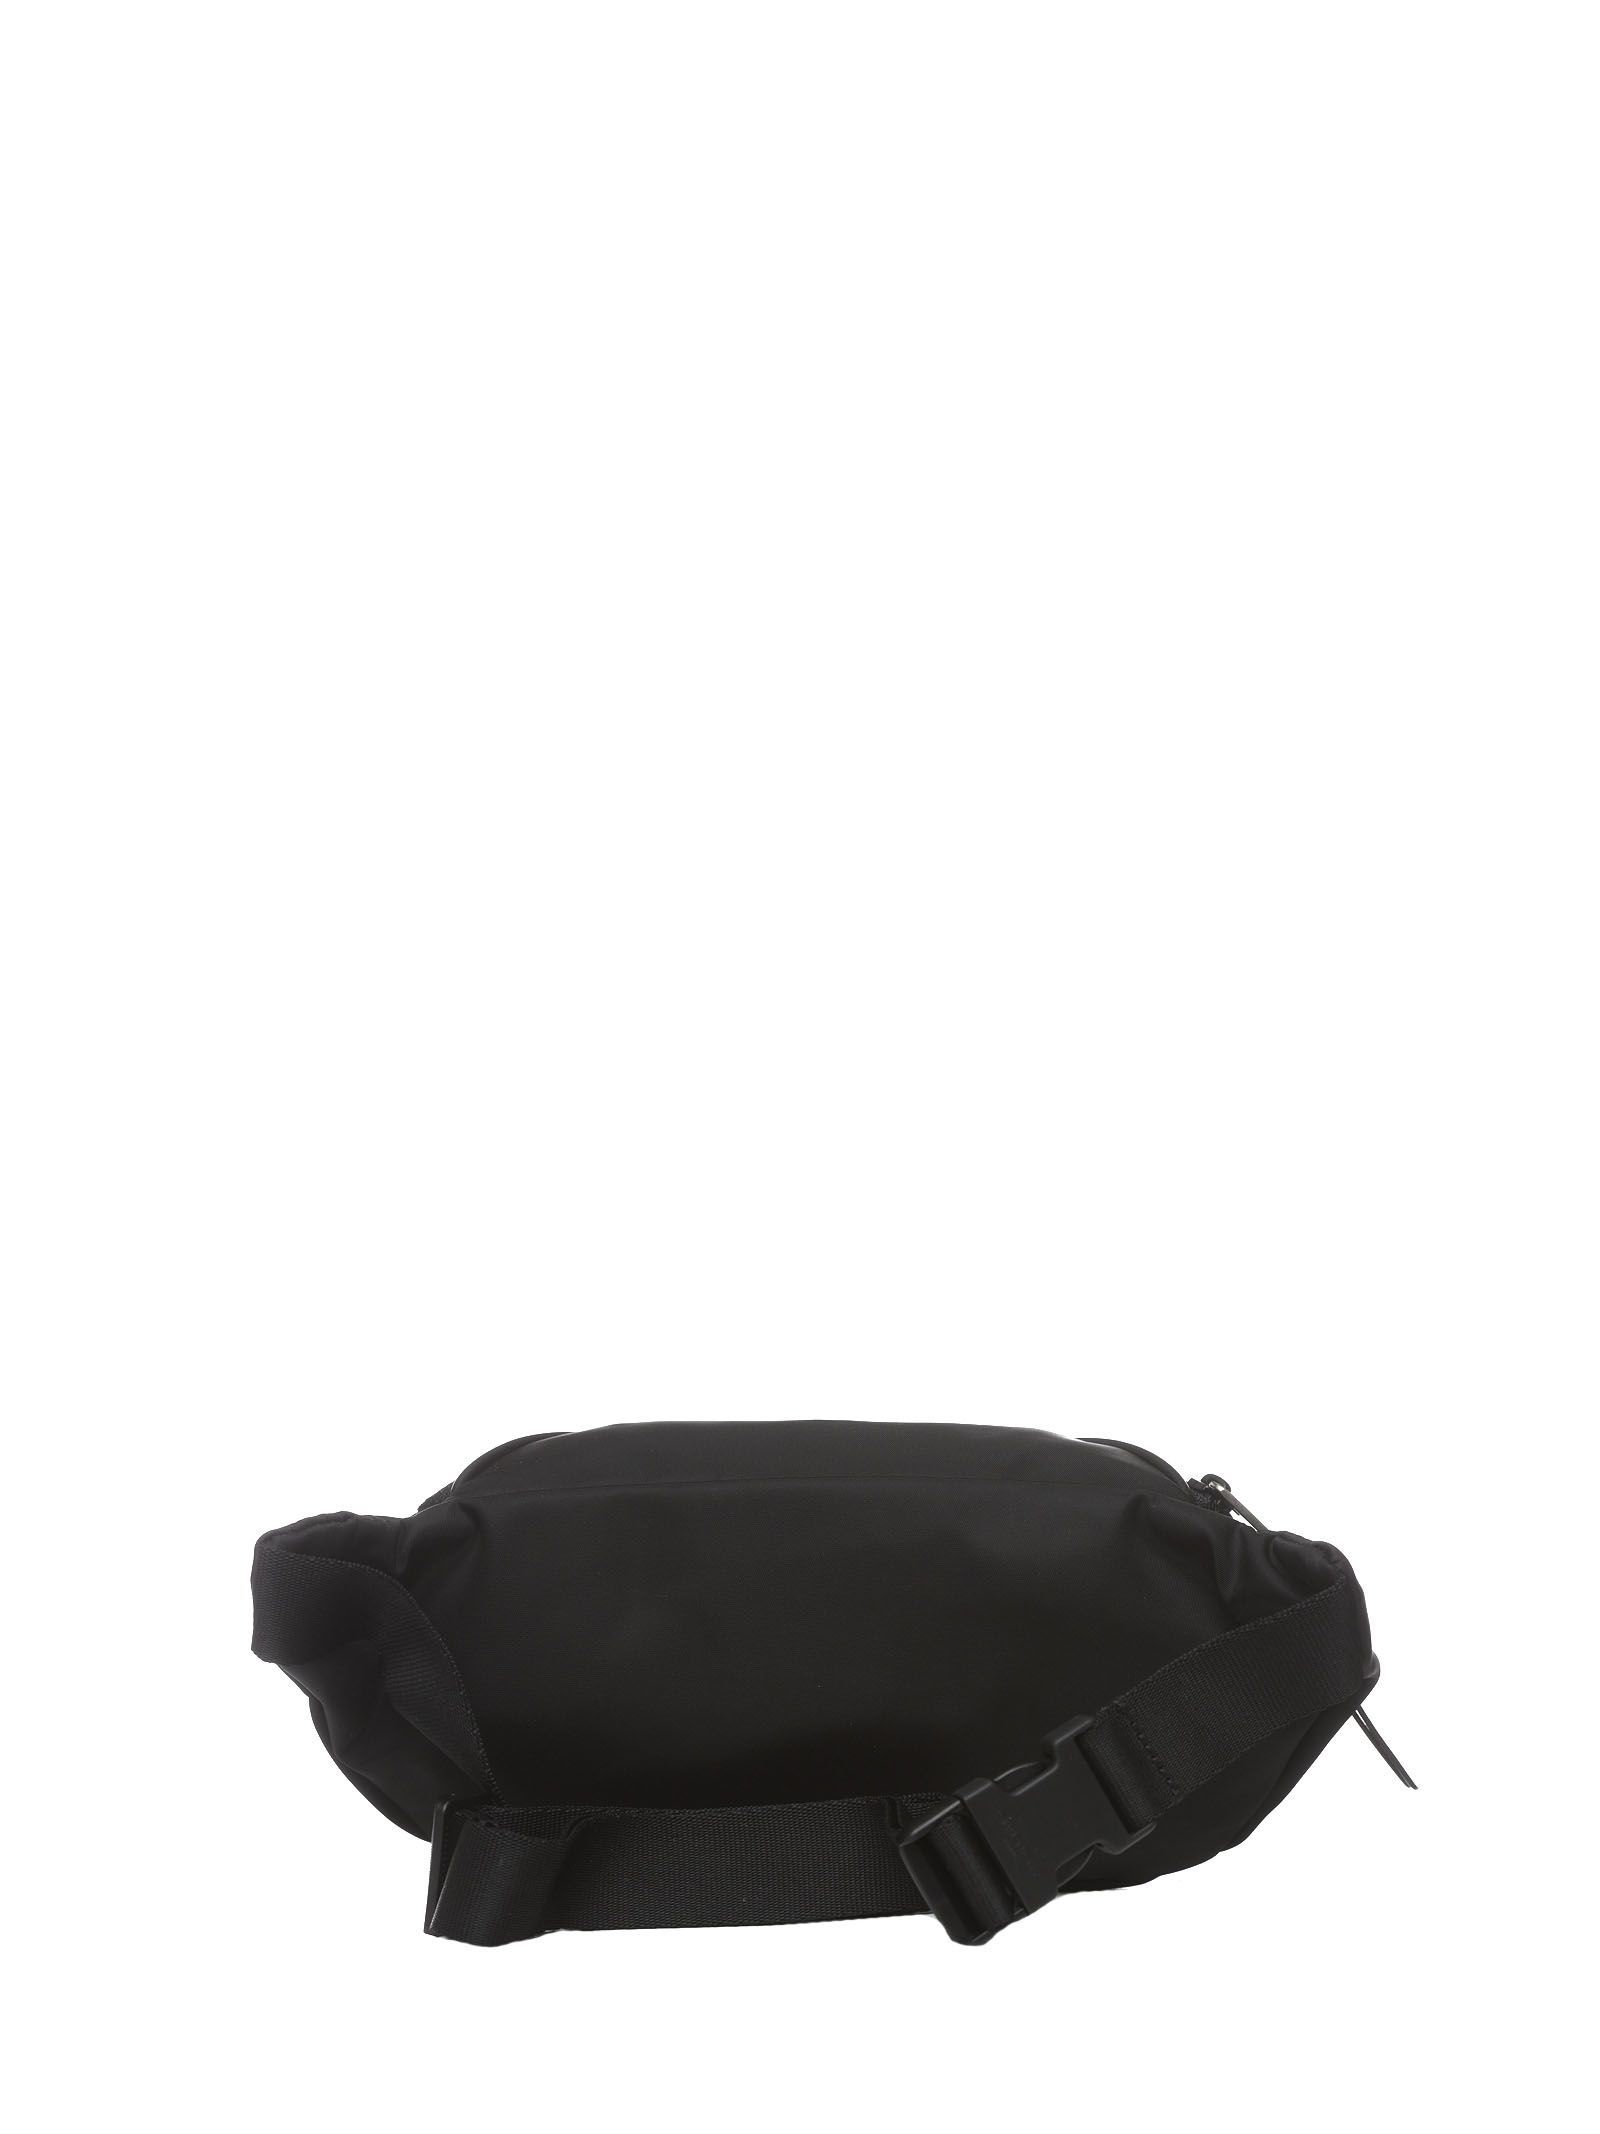 da450e94f8 Givenchy Givenchy Givenchy 4g Bum Bag - BLACK WHITE - 10851532